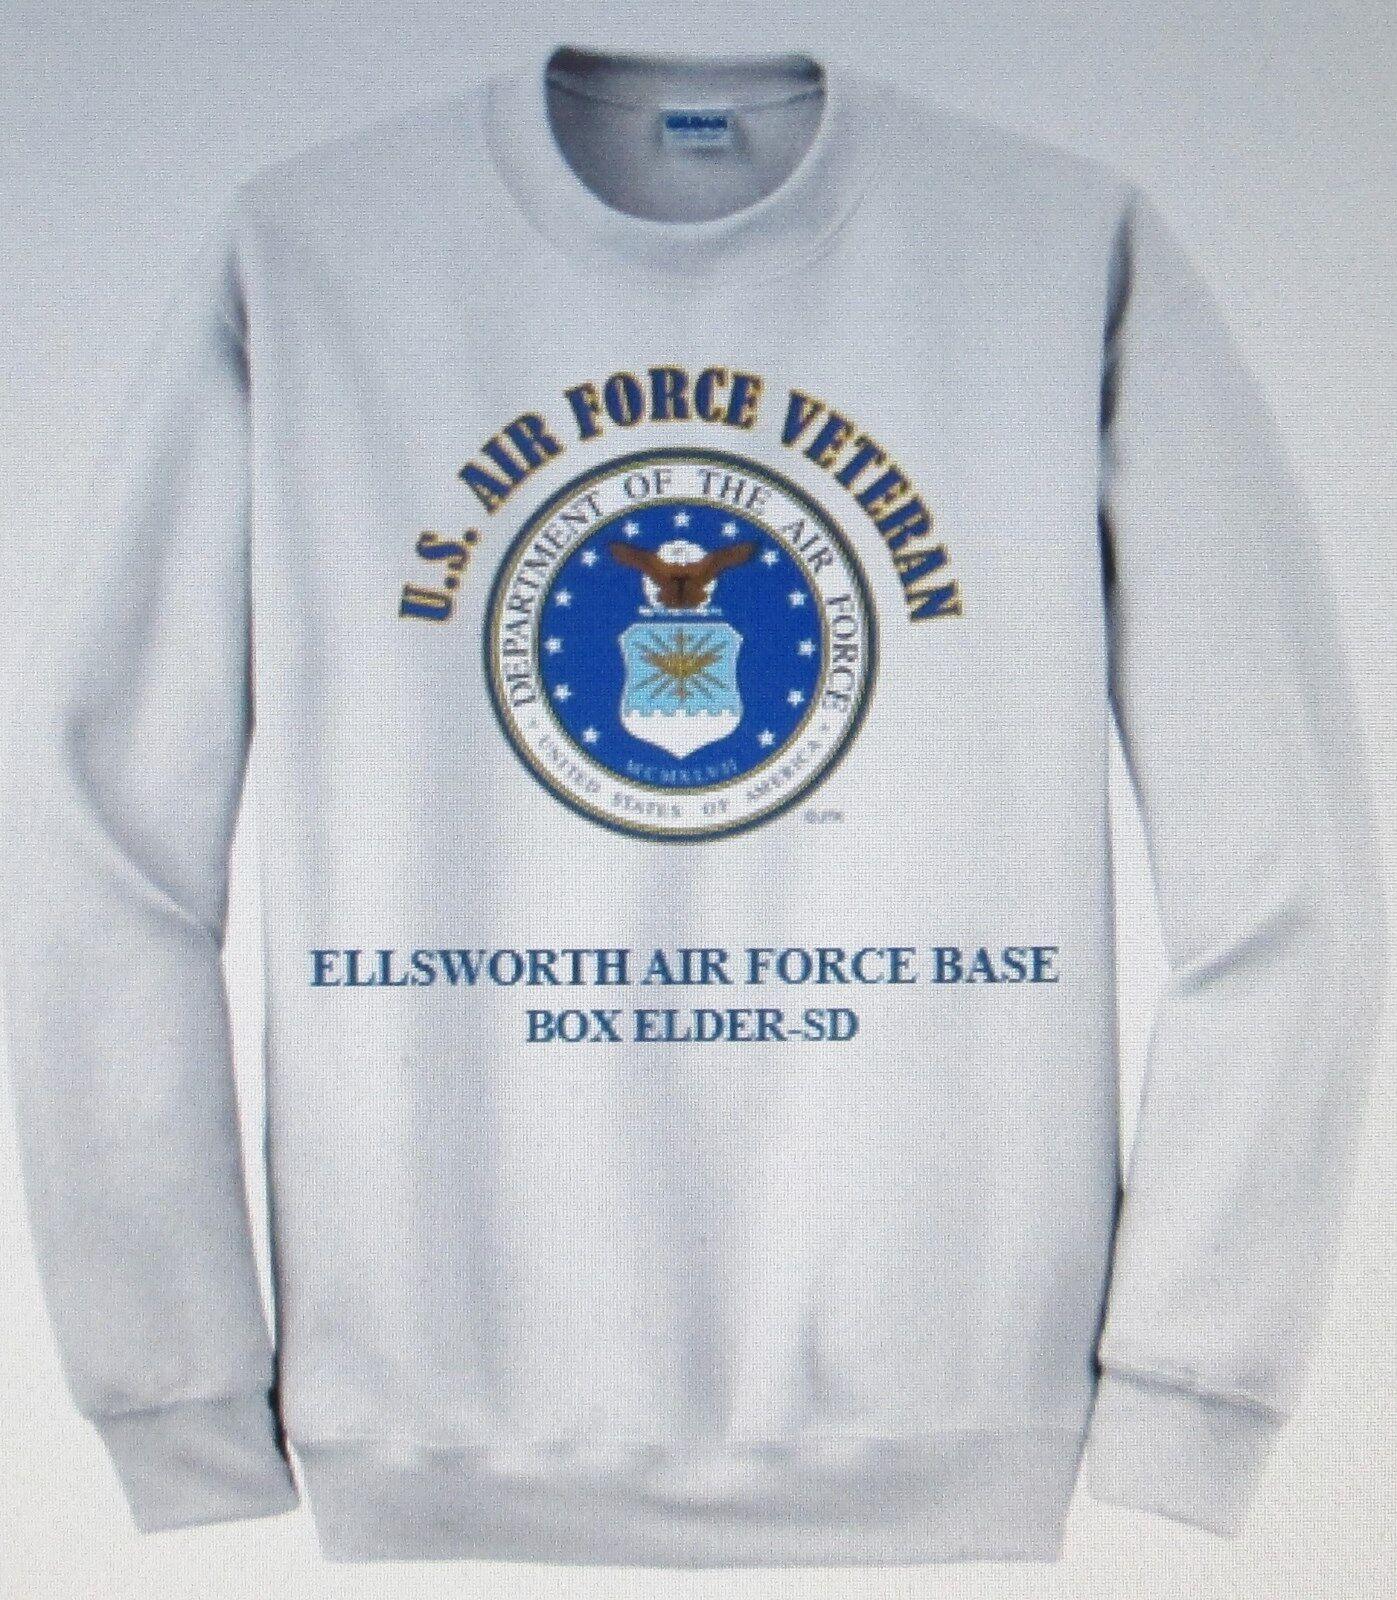 ELLSWORTH AIR FORCE BASE BOX ELDER-SD U.S. AIR FORCE EMBLEM SWEATSHIRT